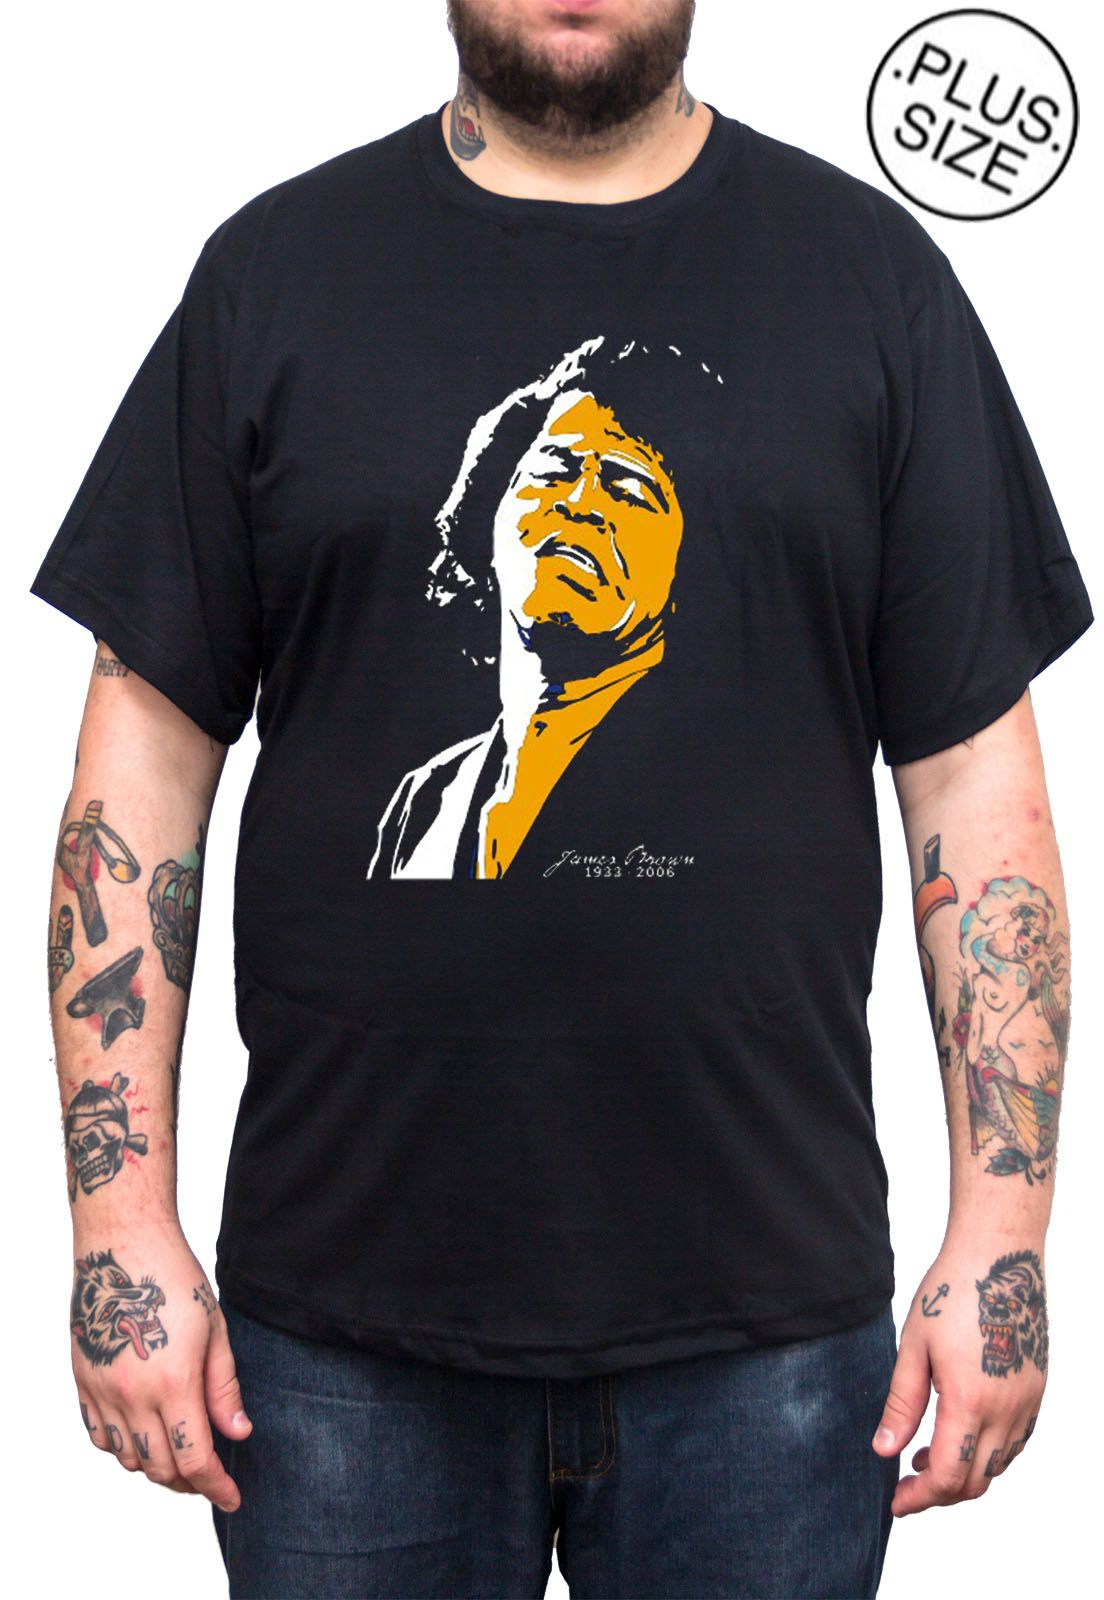 Camiseta Hshop James Brown - Preto - Plus Size - Tamanho Grande XG  - HShop